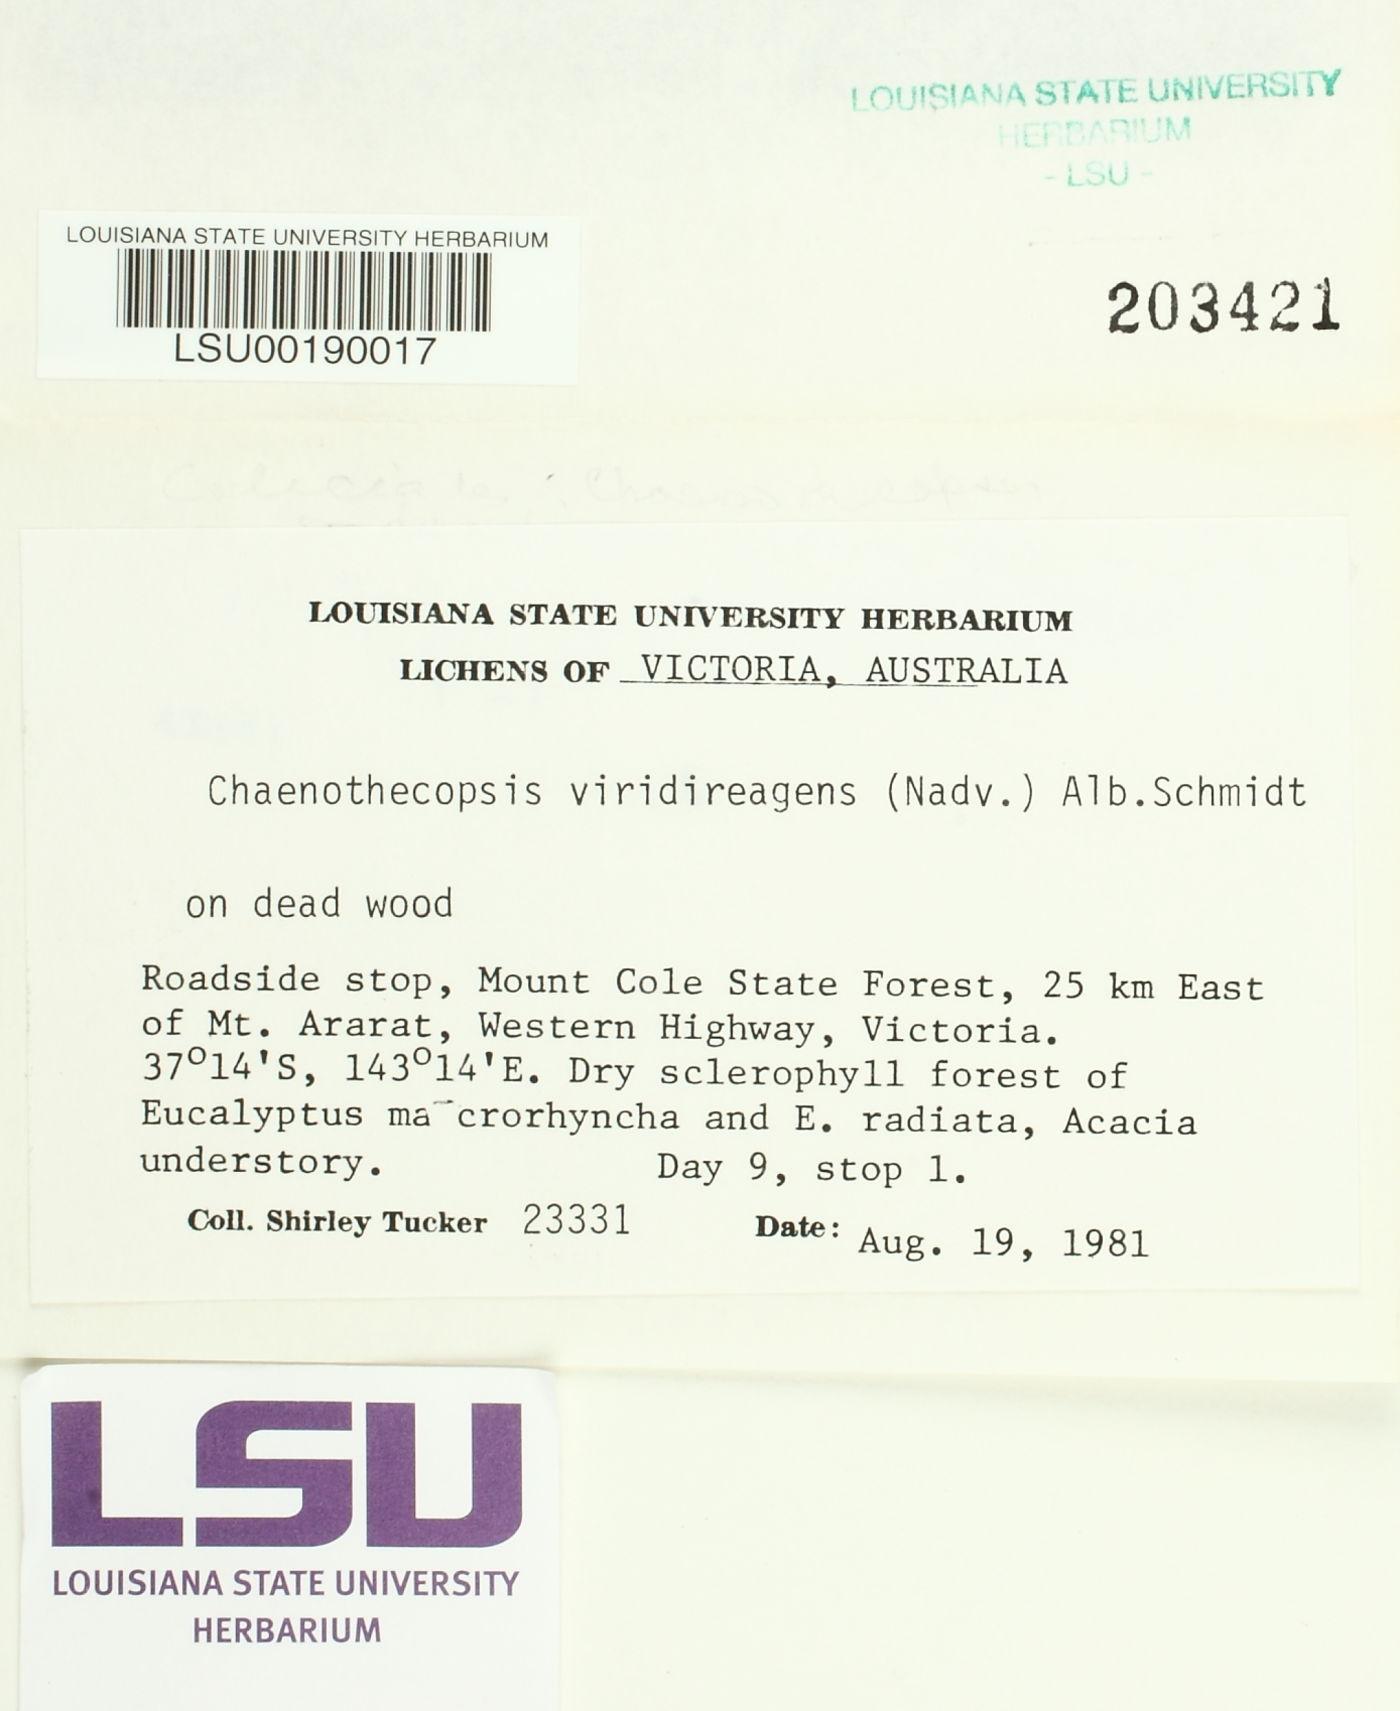 Chaenothecopsis viridireagens image